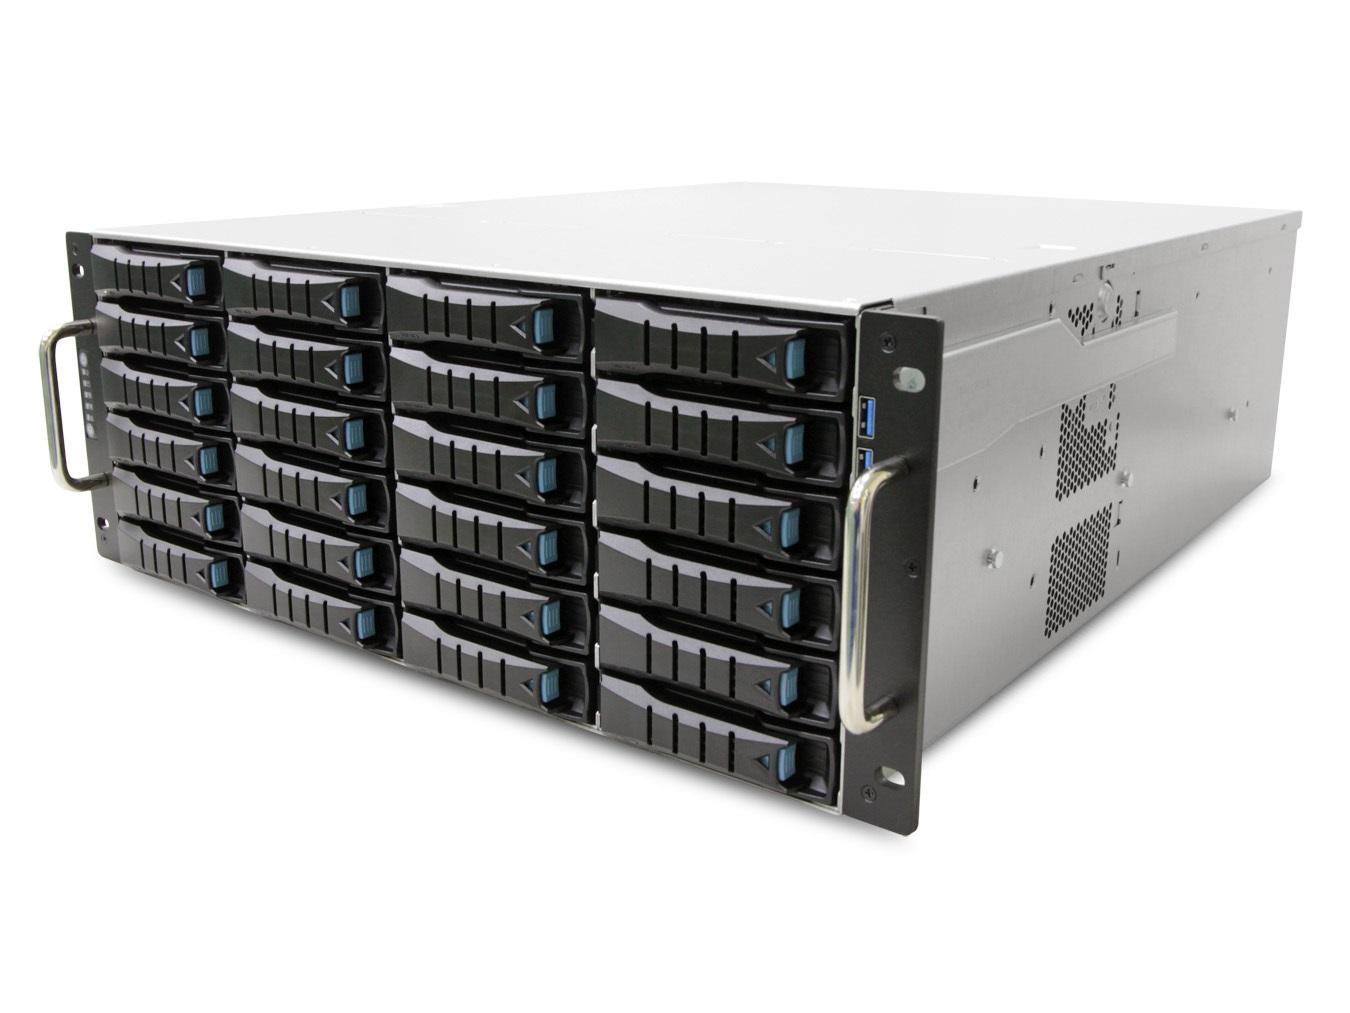 AIC RSC-4ETS XE1-4ETS0-01 4U 24-bay Storage Server Chassis